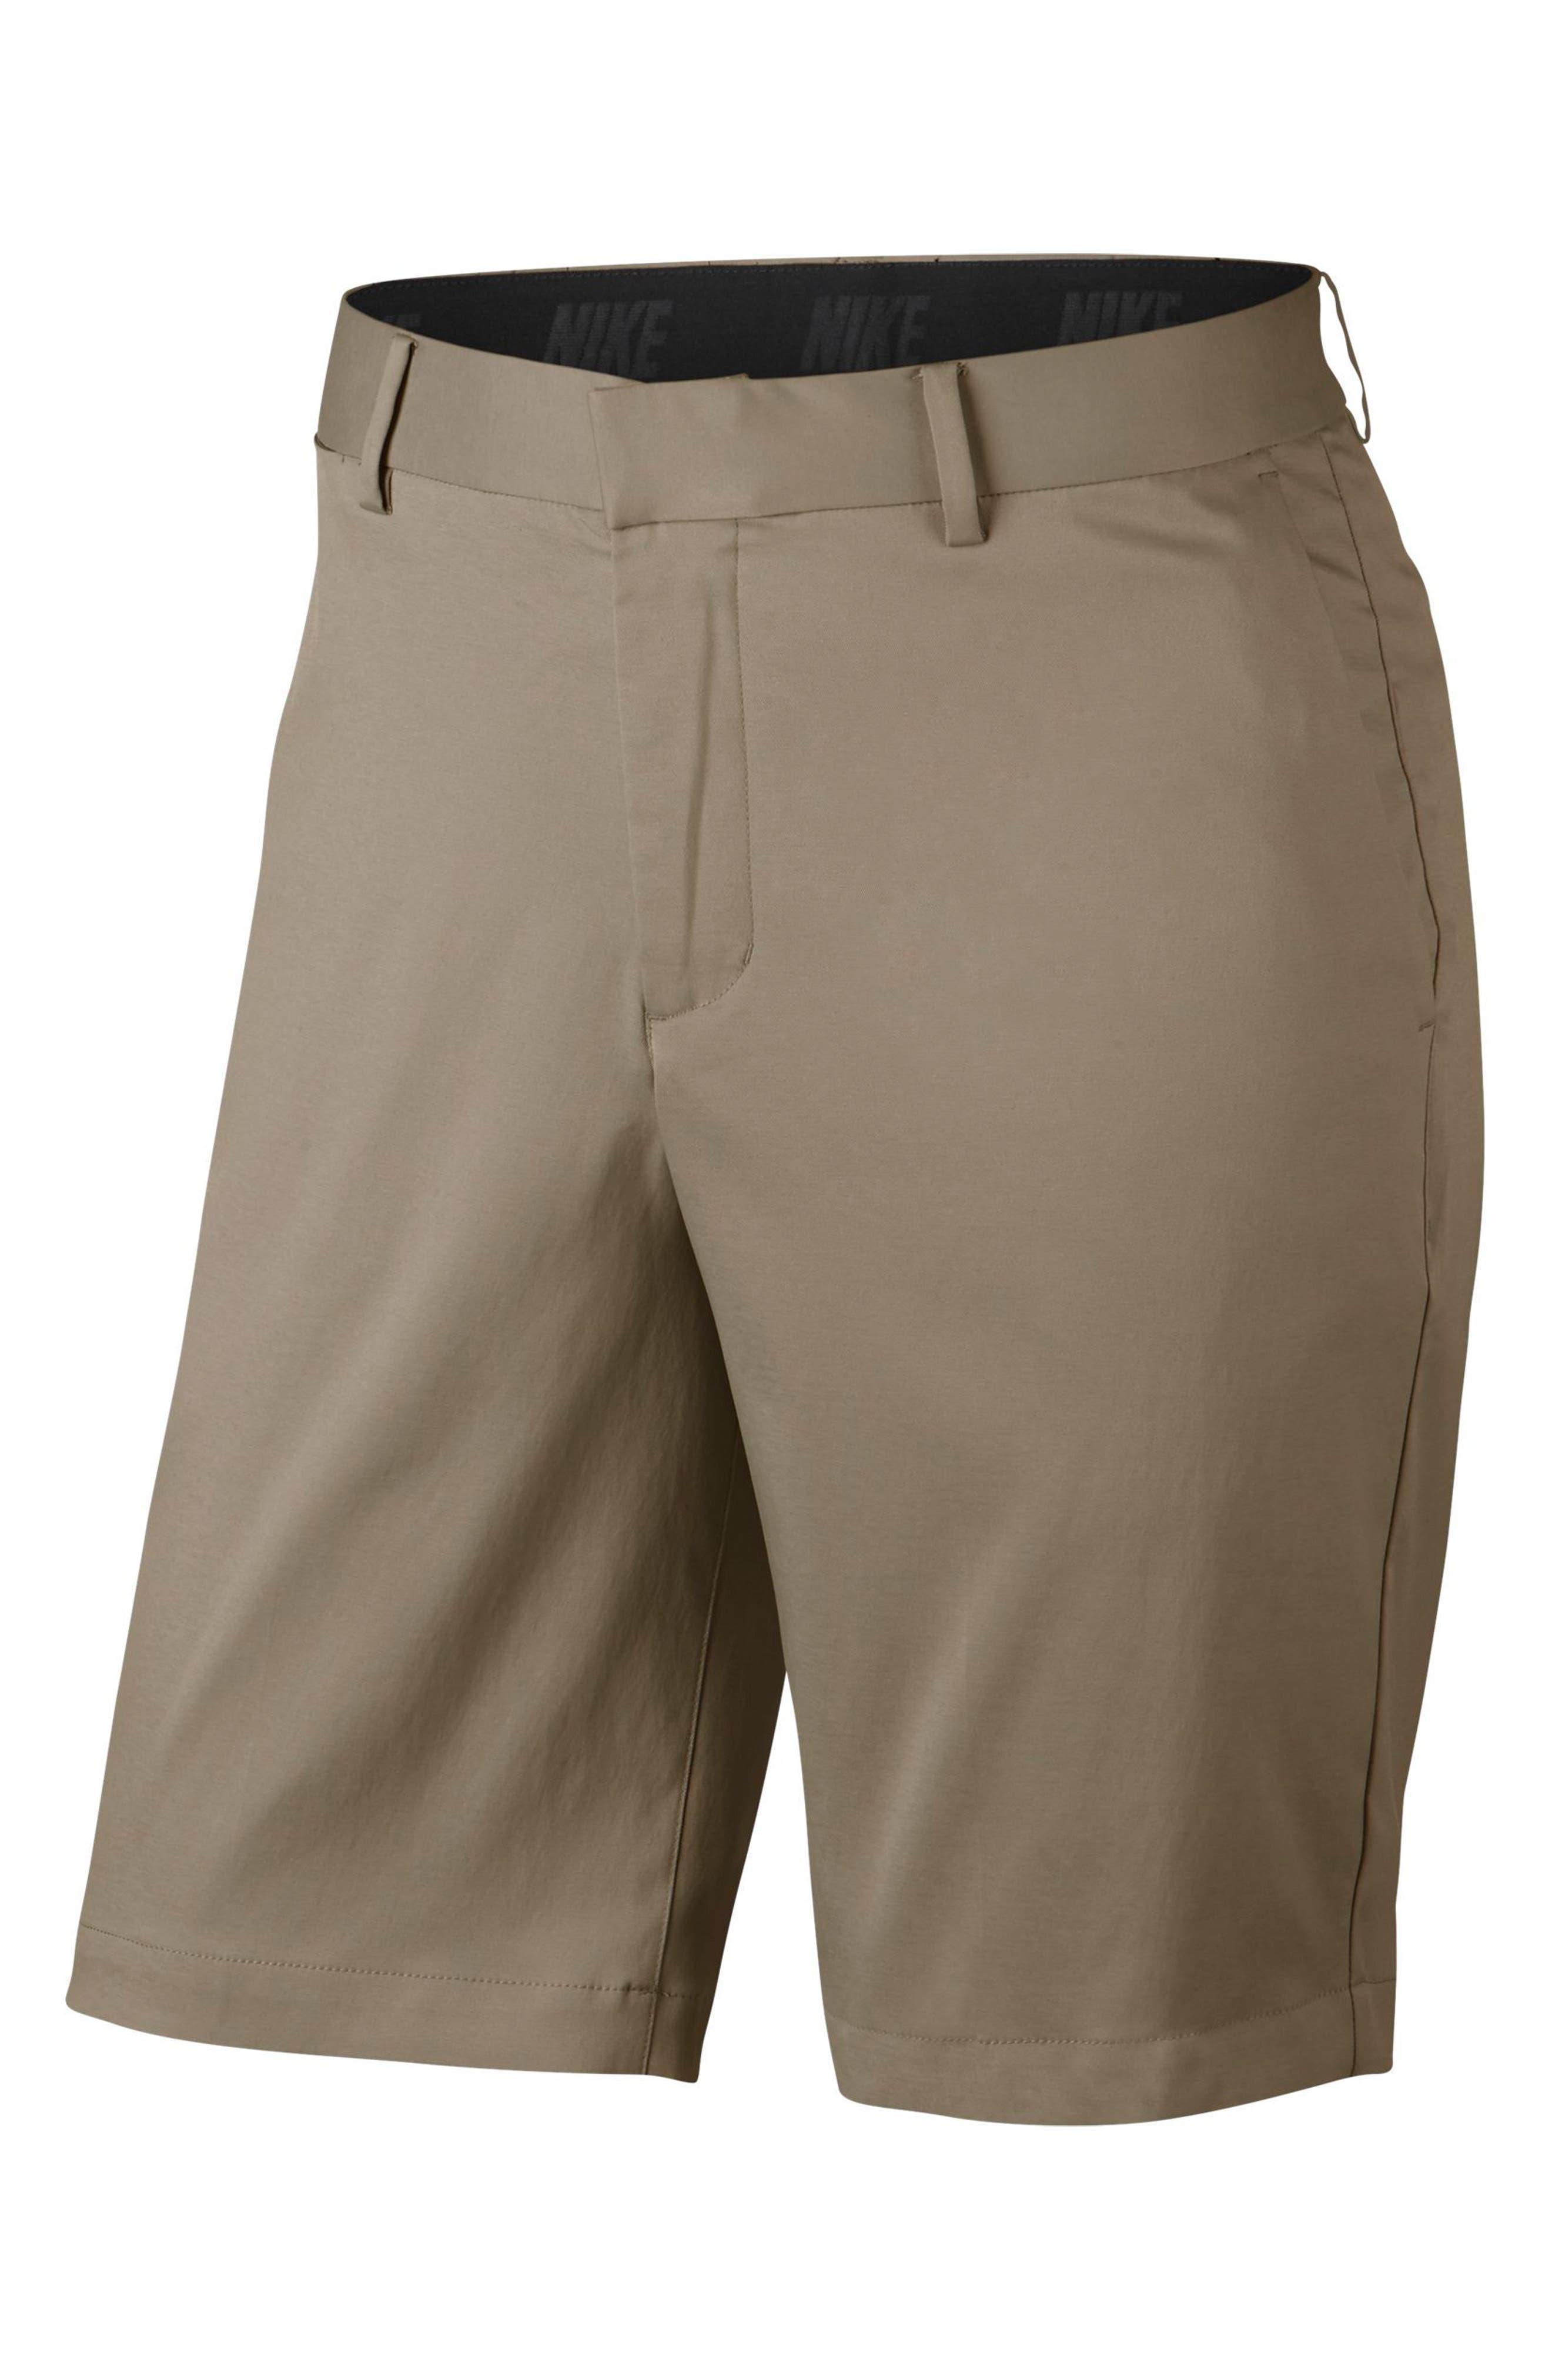 Flat Front Golf Shorts,                             Alternate thumbnail 49, color,